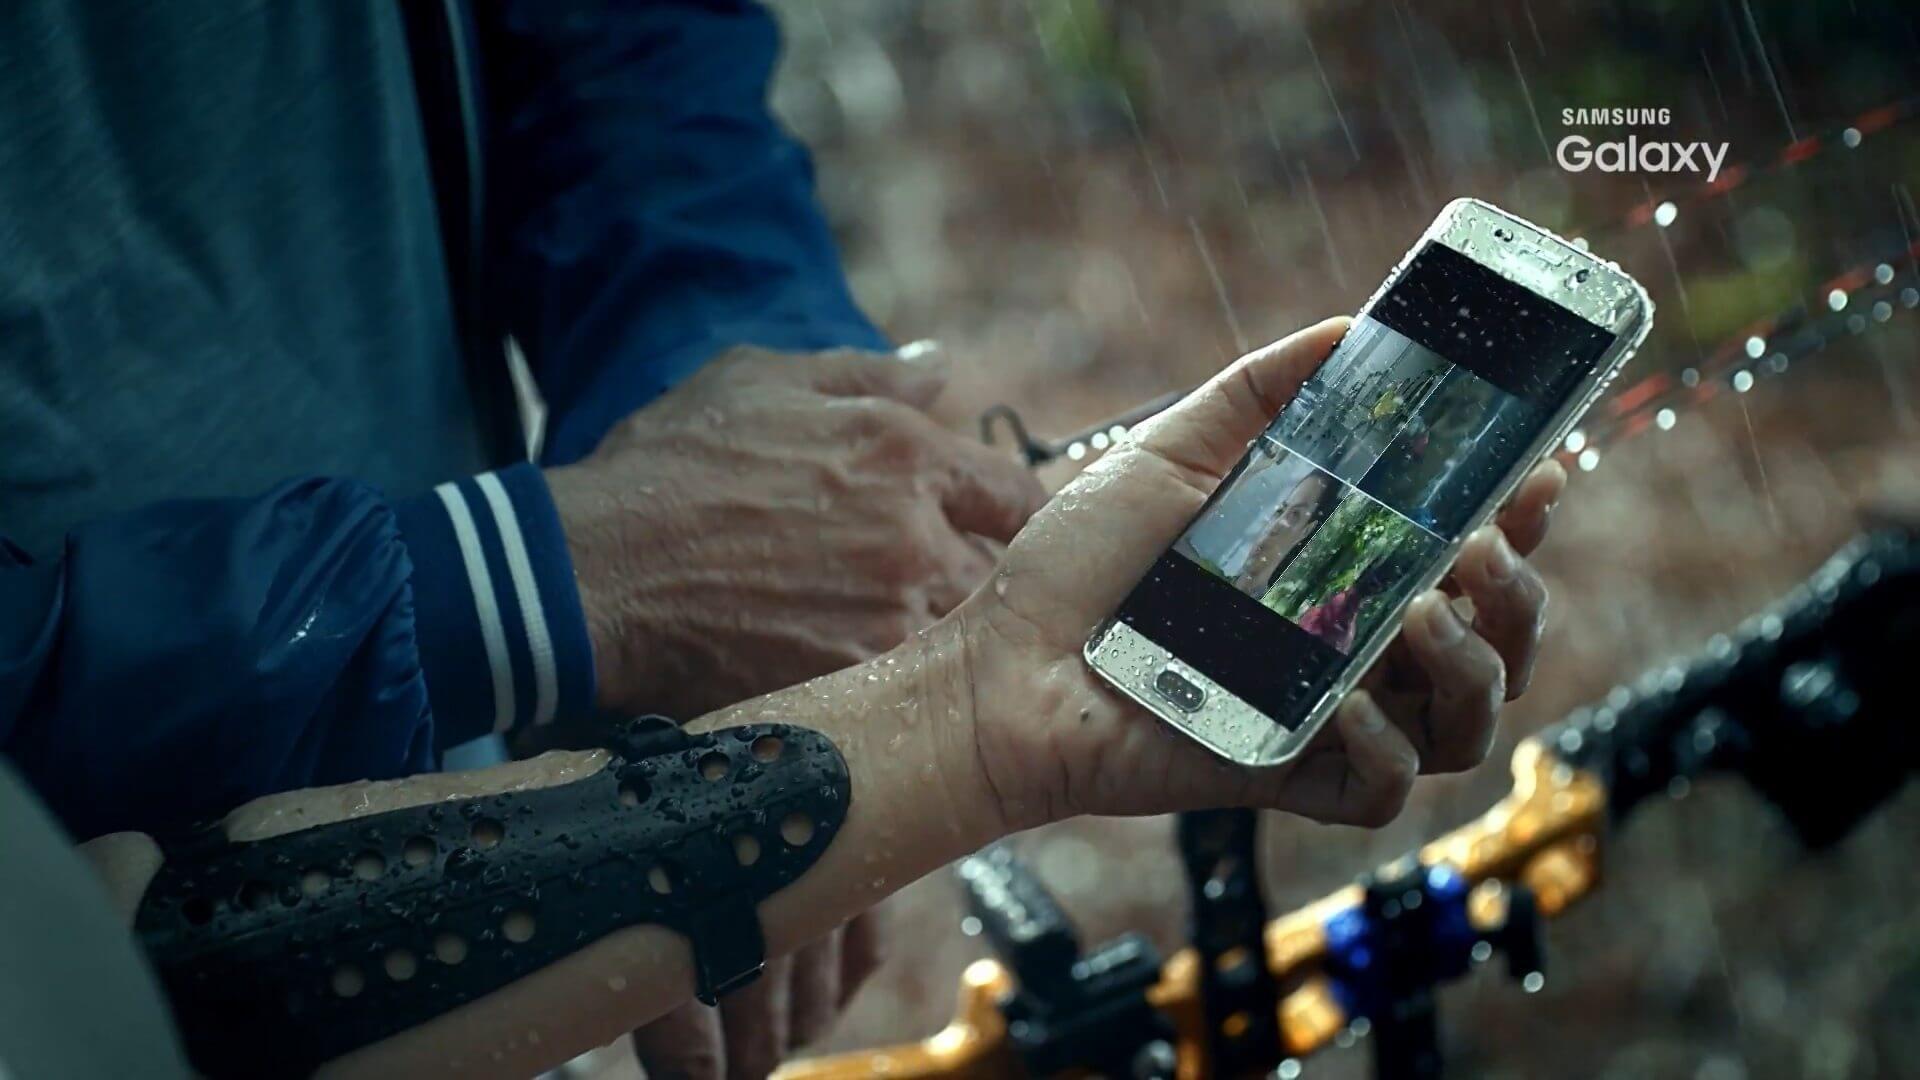 Pode chover! Vídeo indica que Galaxy S7 será à prova d'água